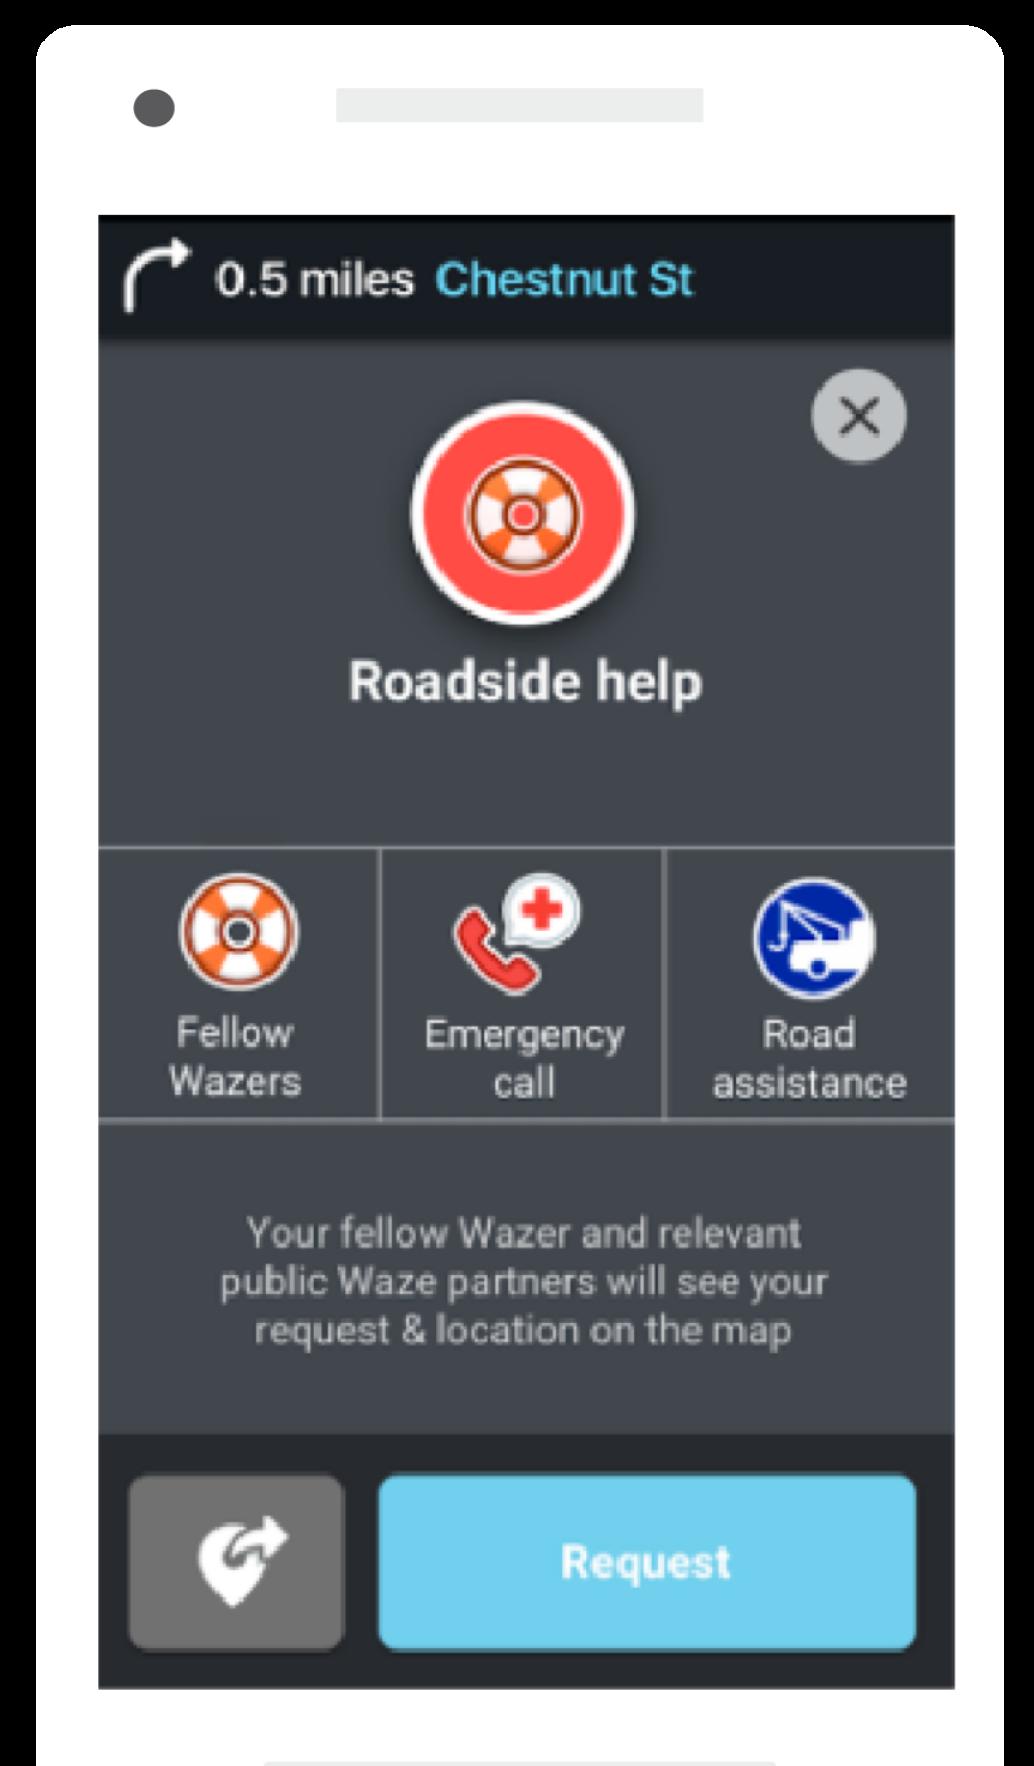 Waze - The Power of Custom App Integrations | Mobile Marketing